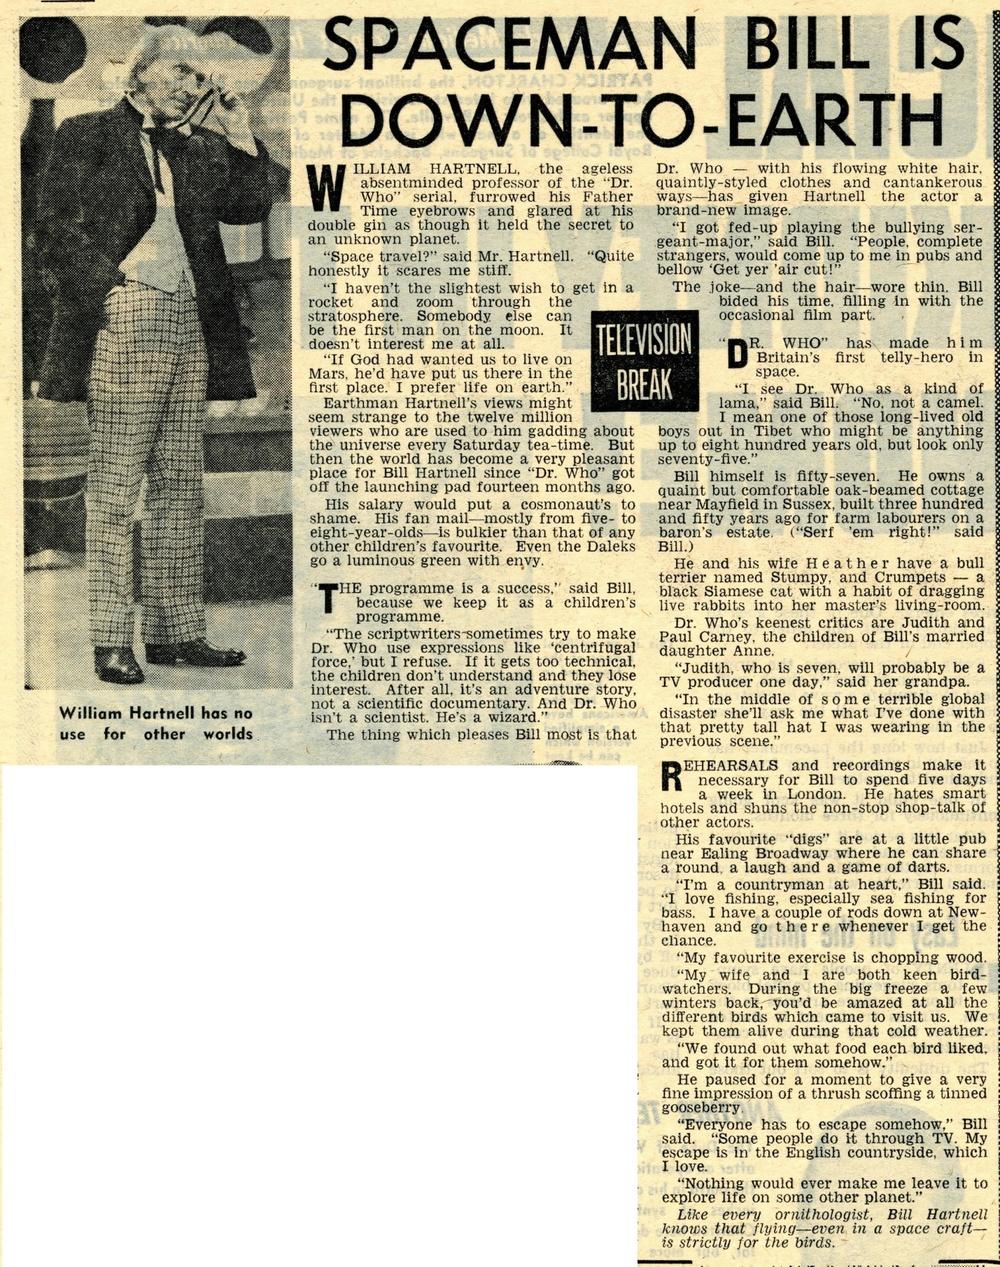 Reveille, January 7-13, 1965